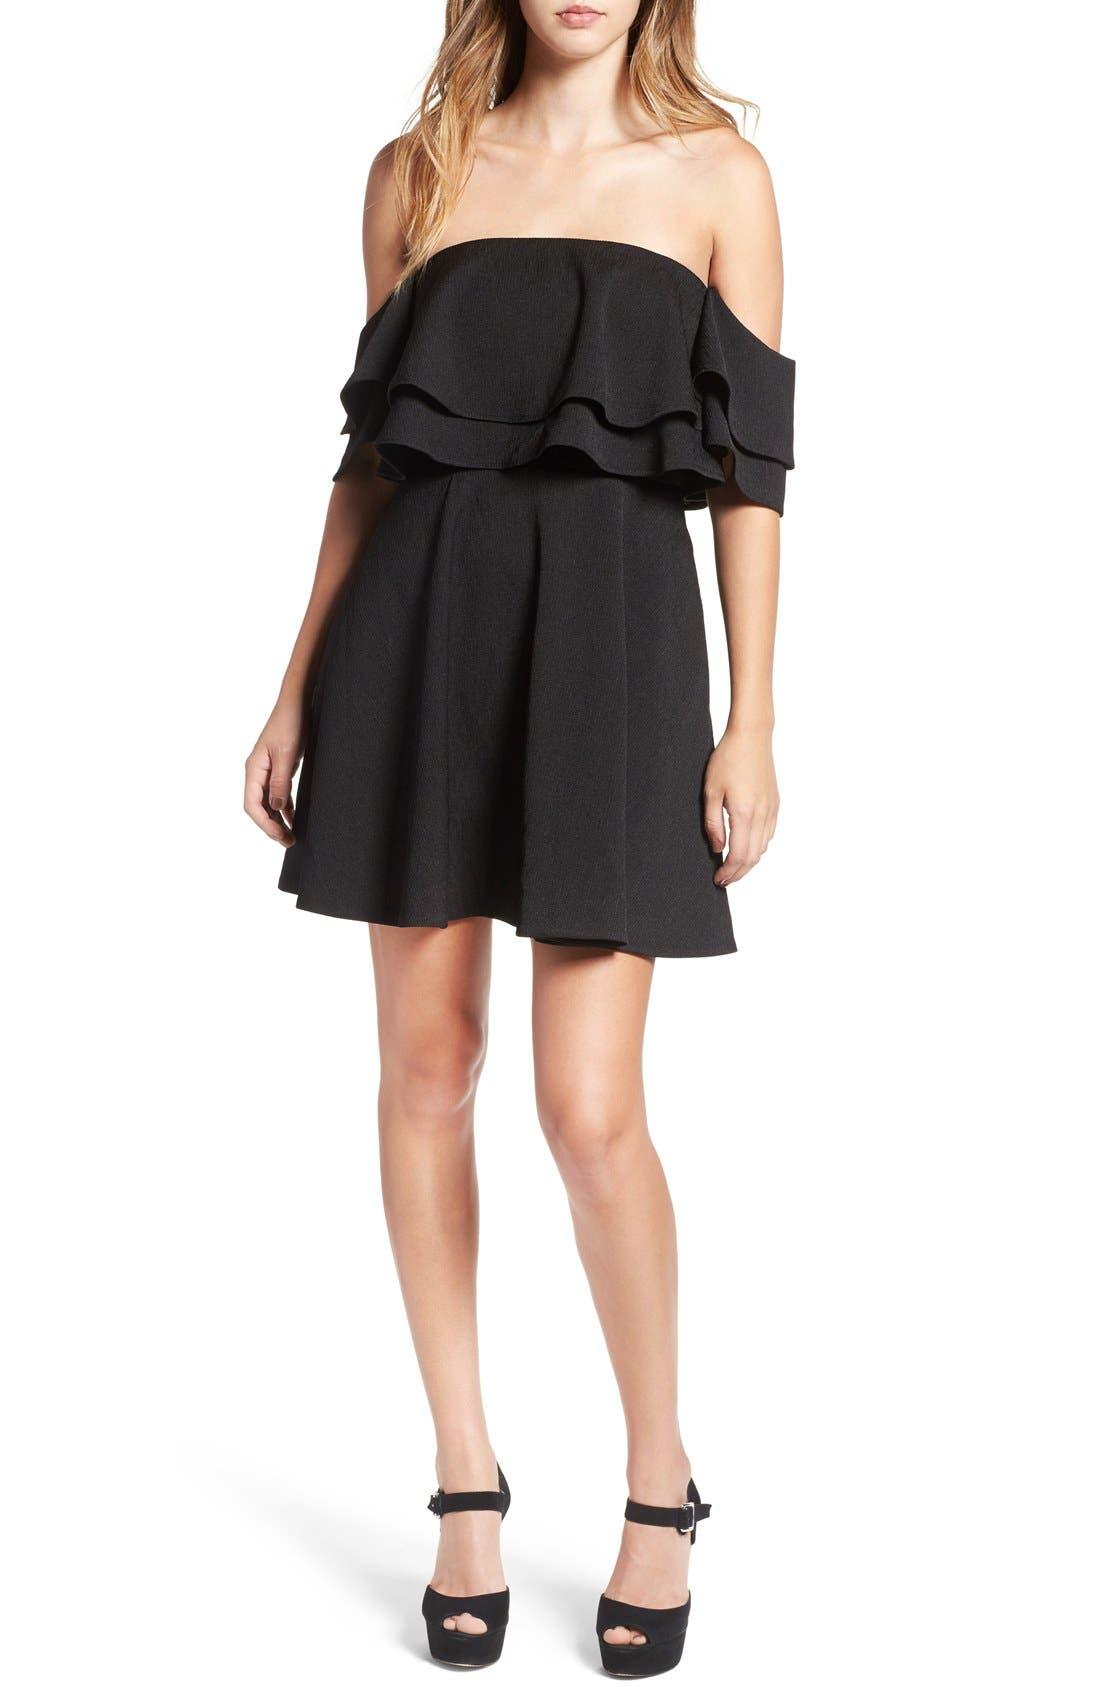 Alternate Image 1 Selected - Keepsake the Label 'Two Fold' Off the Shoulder Minidress